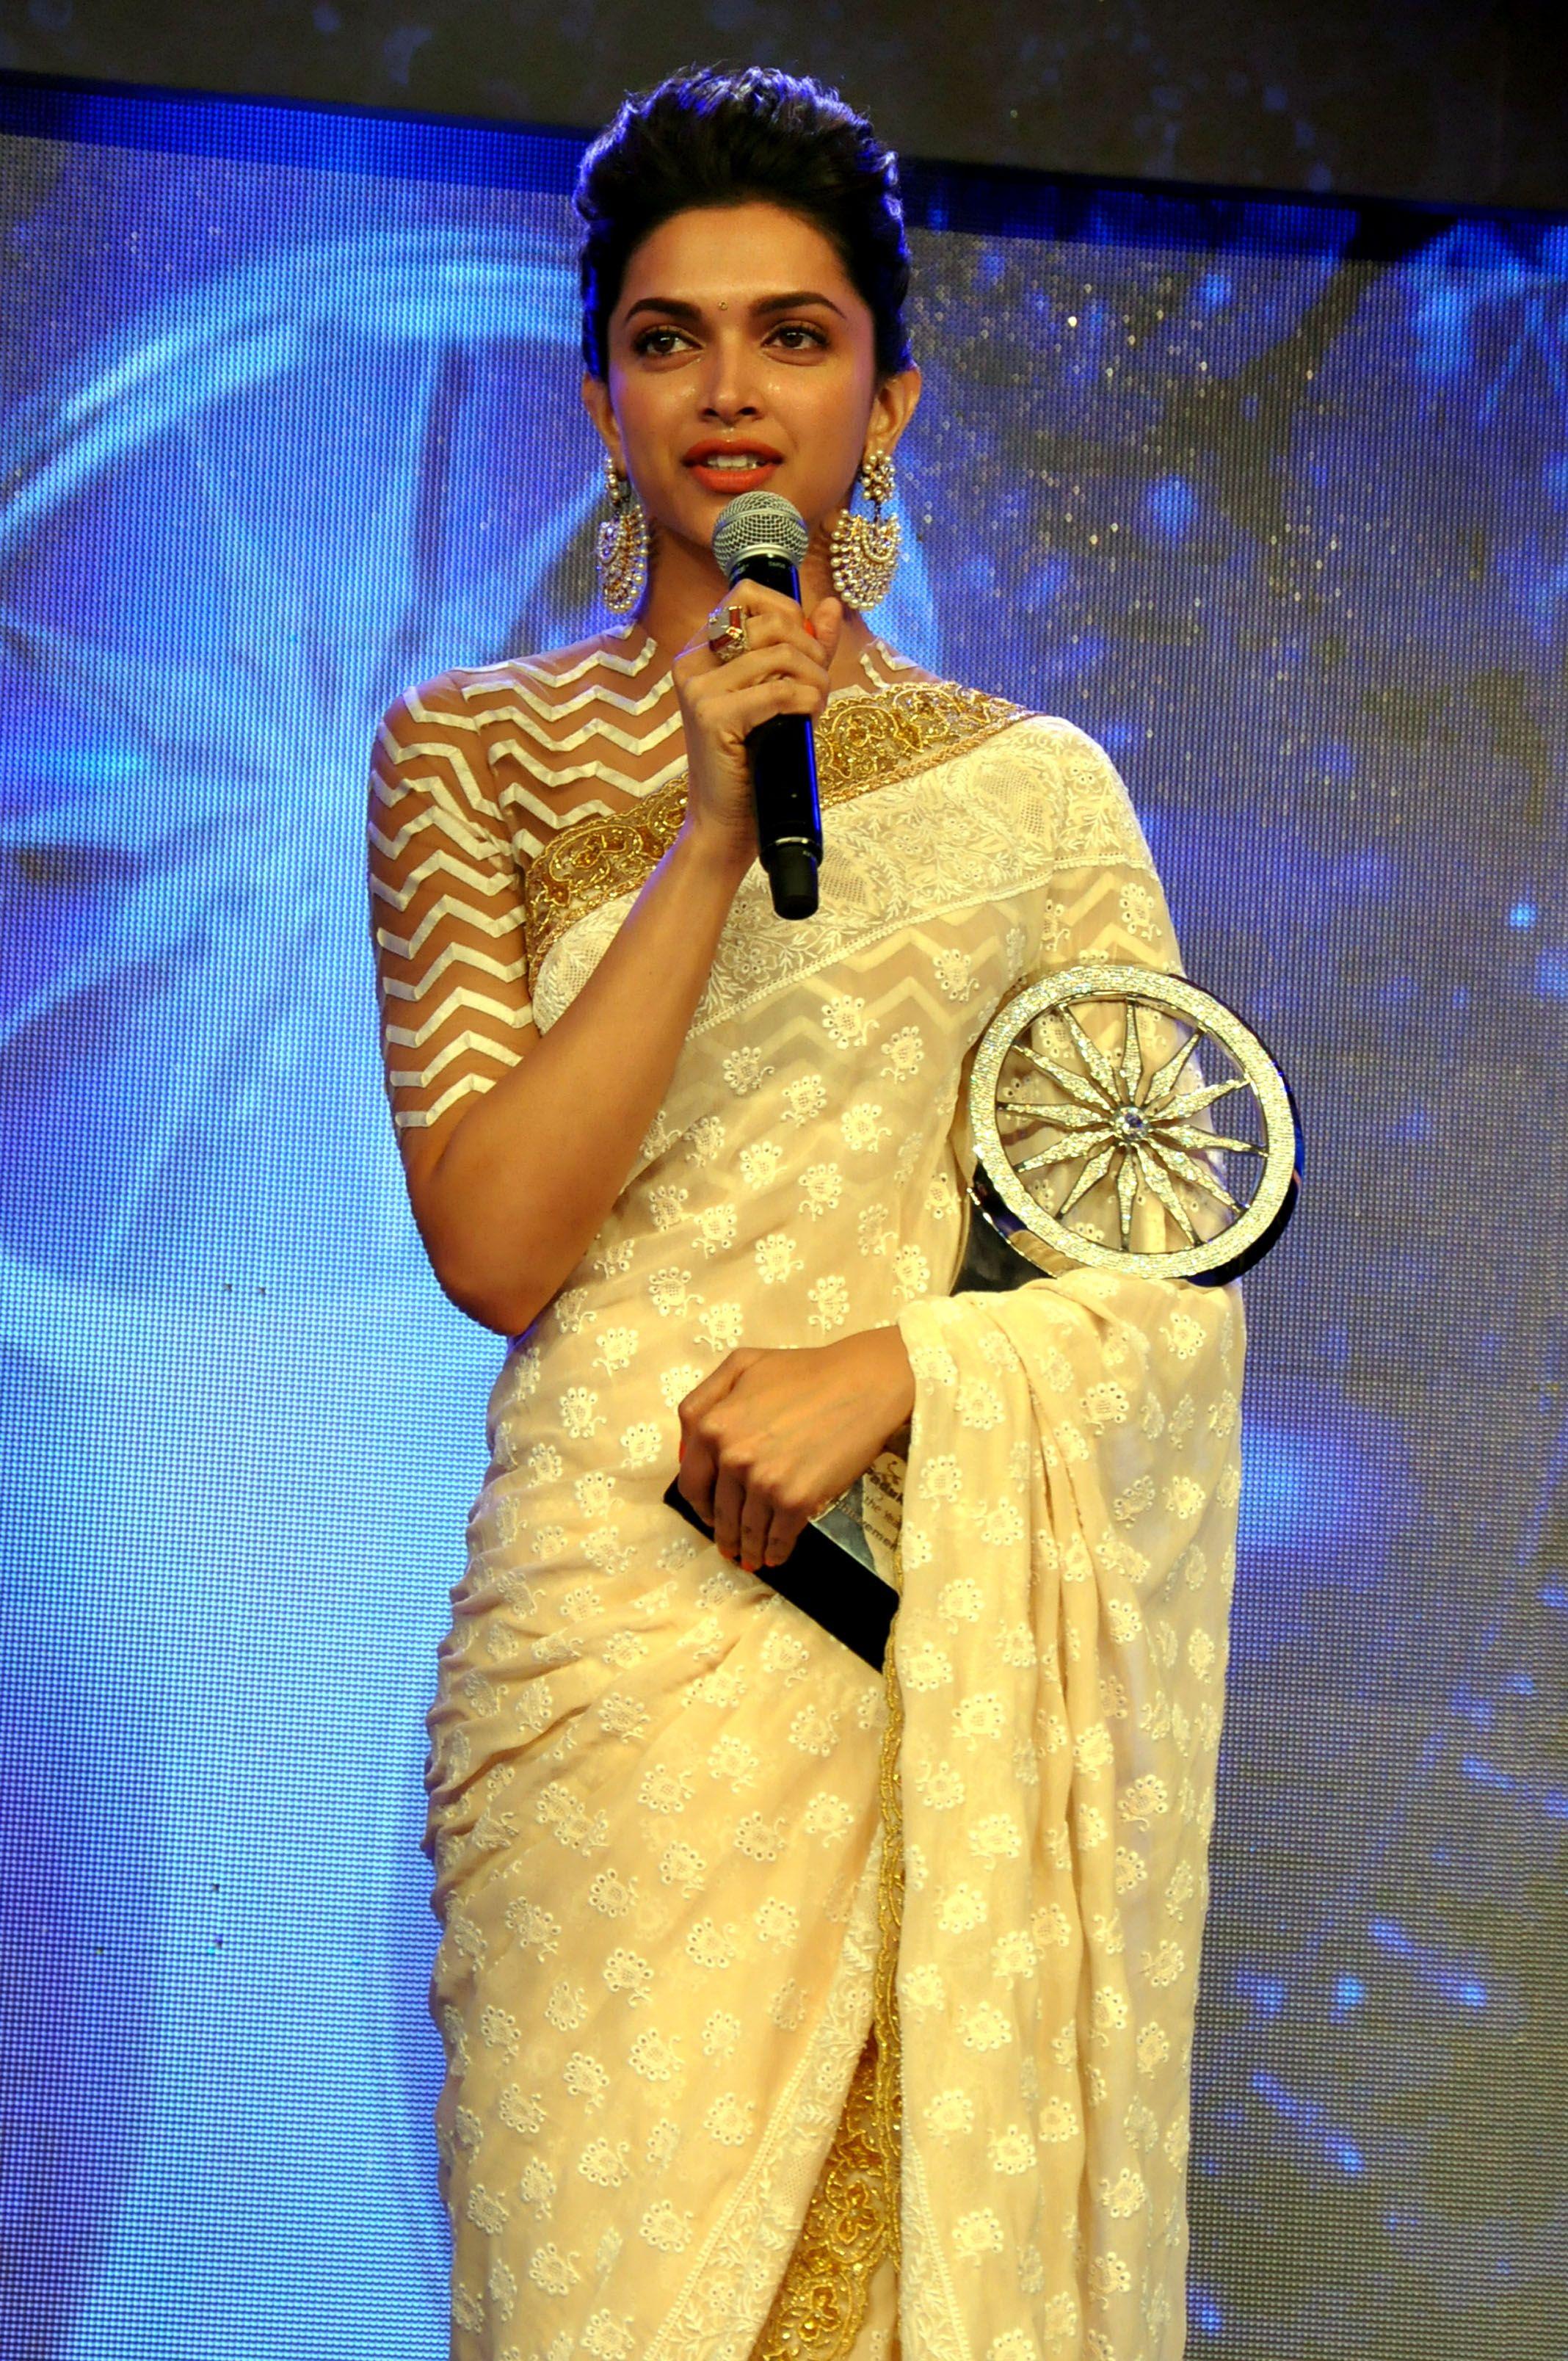 blouse | Deepika padukone saree, Blouse designs, High neck ...